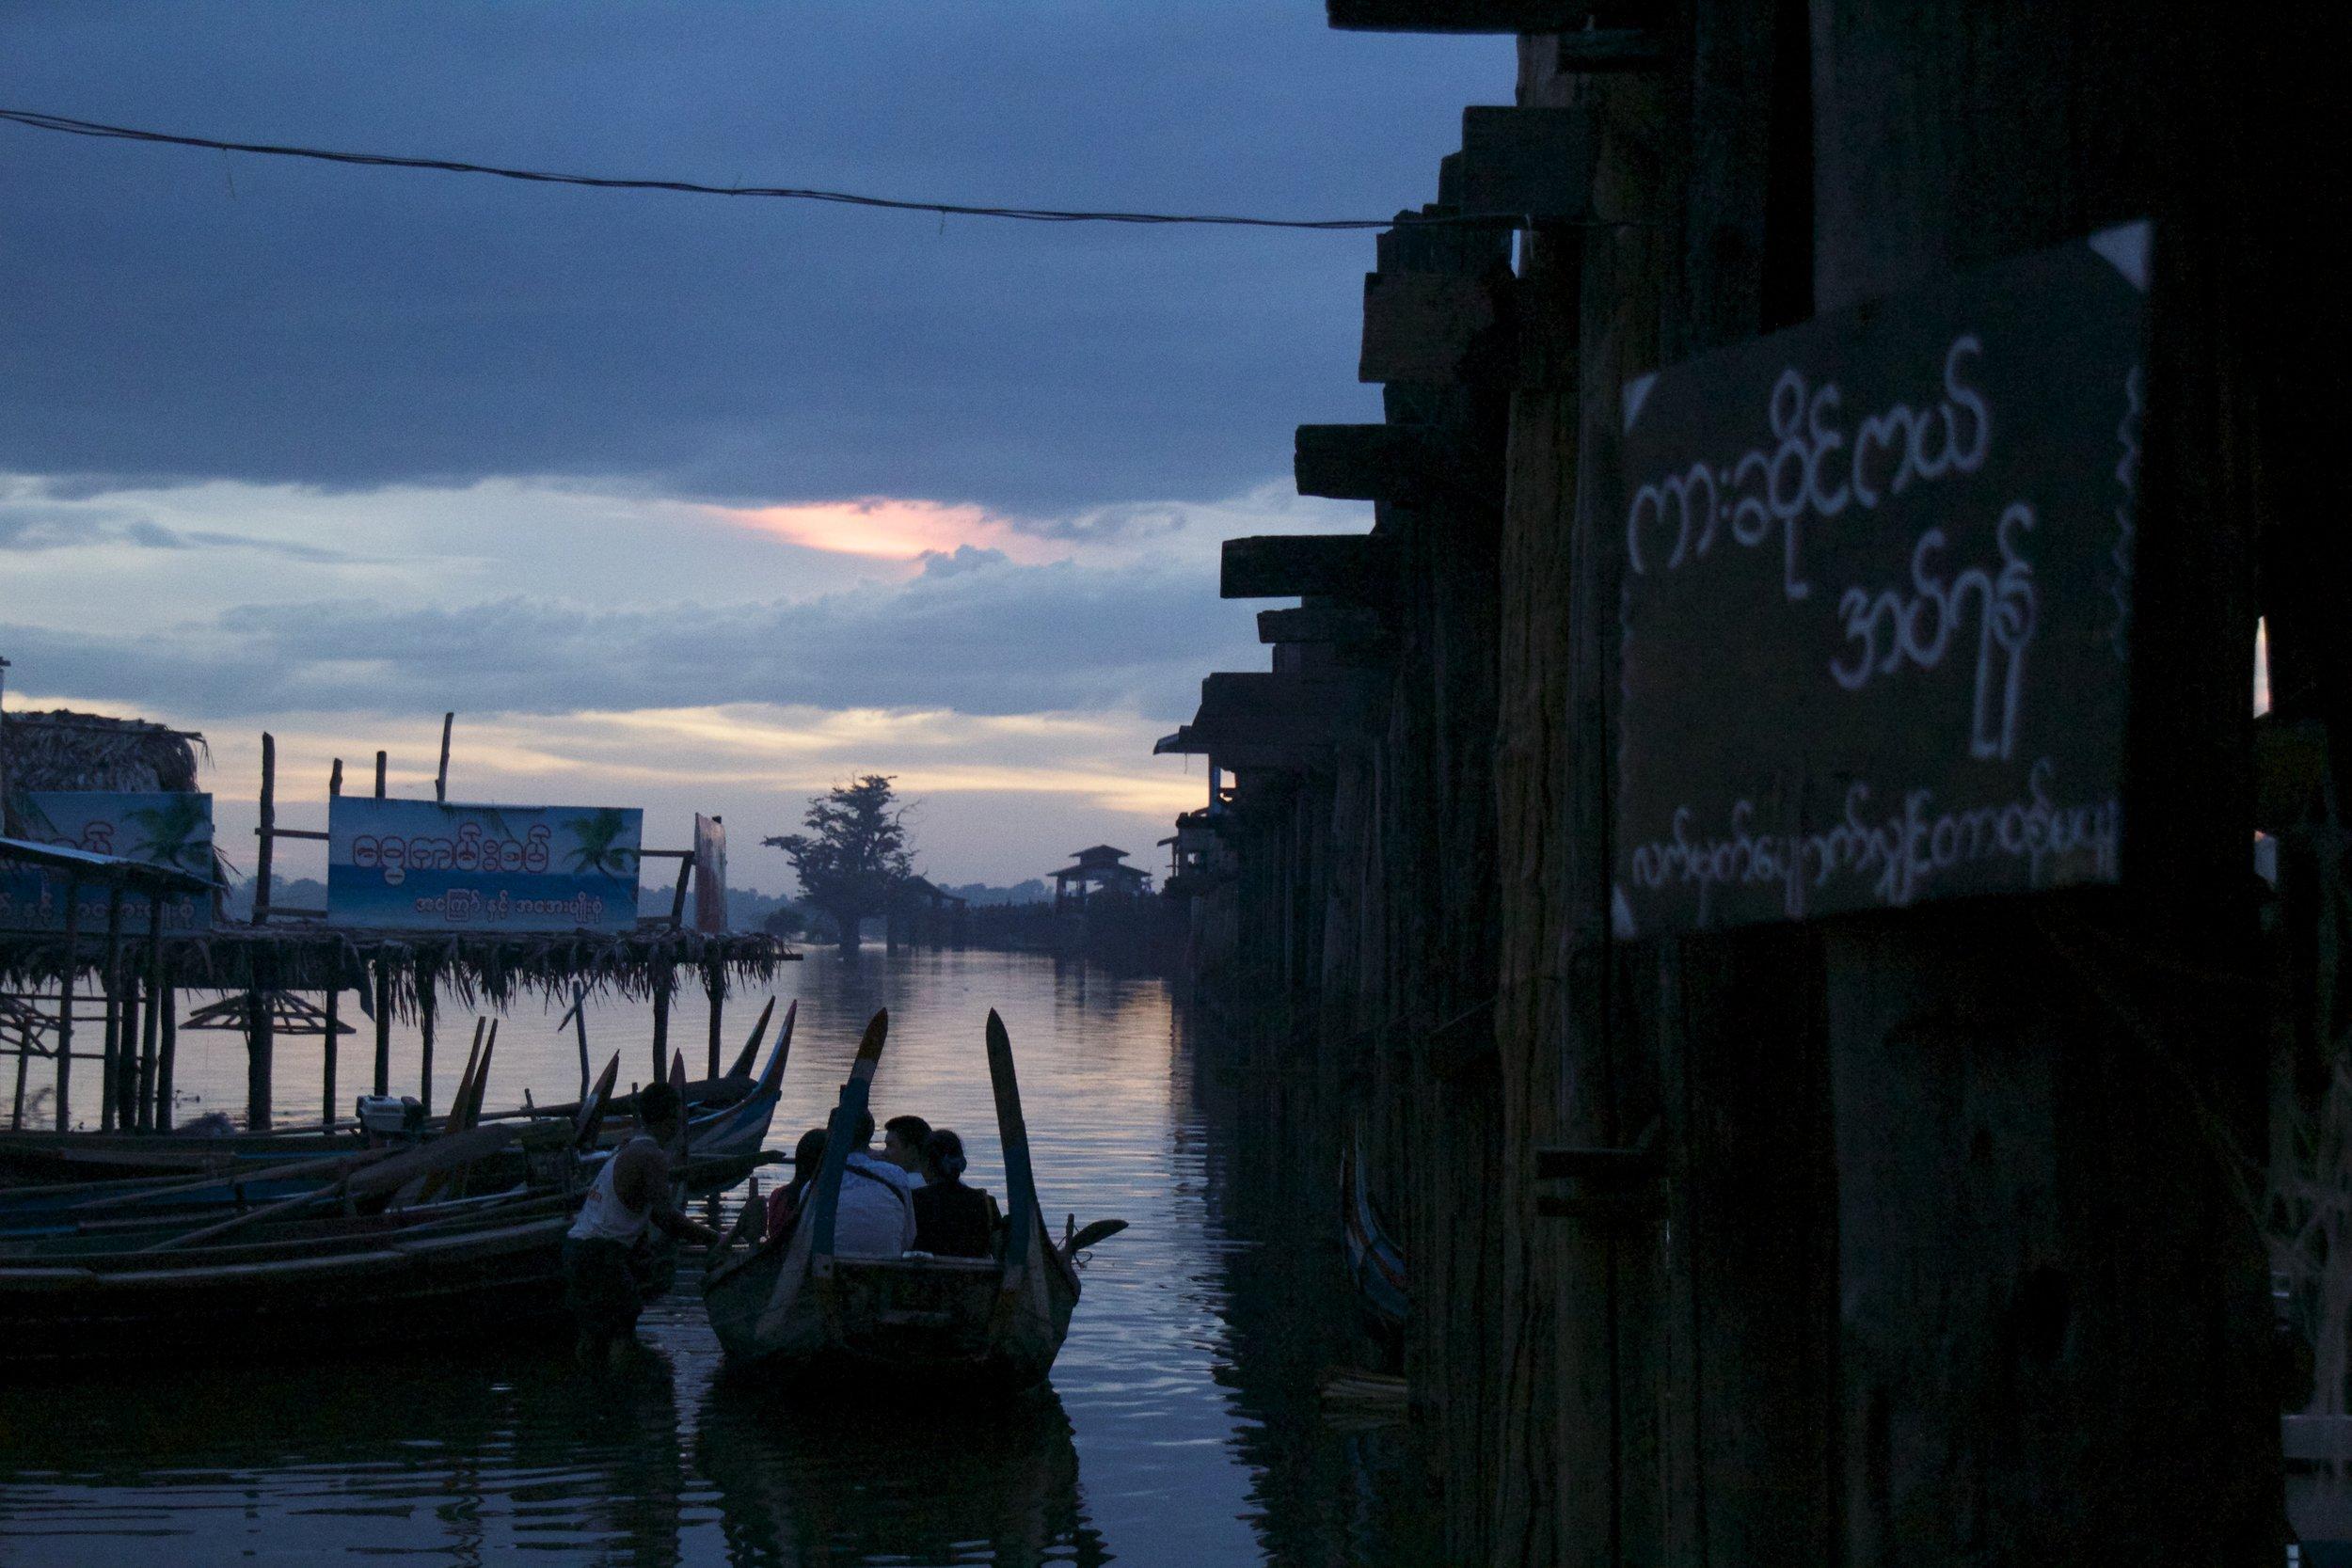 U Bein Bridge Mandalay Burma Myanmar 22.jpg